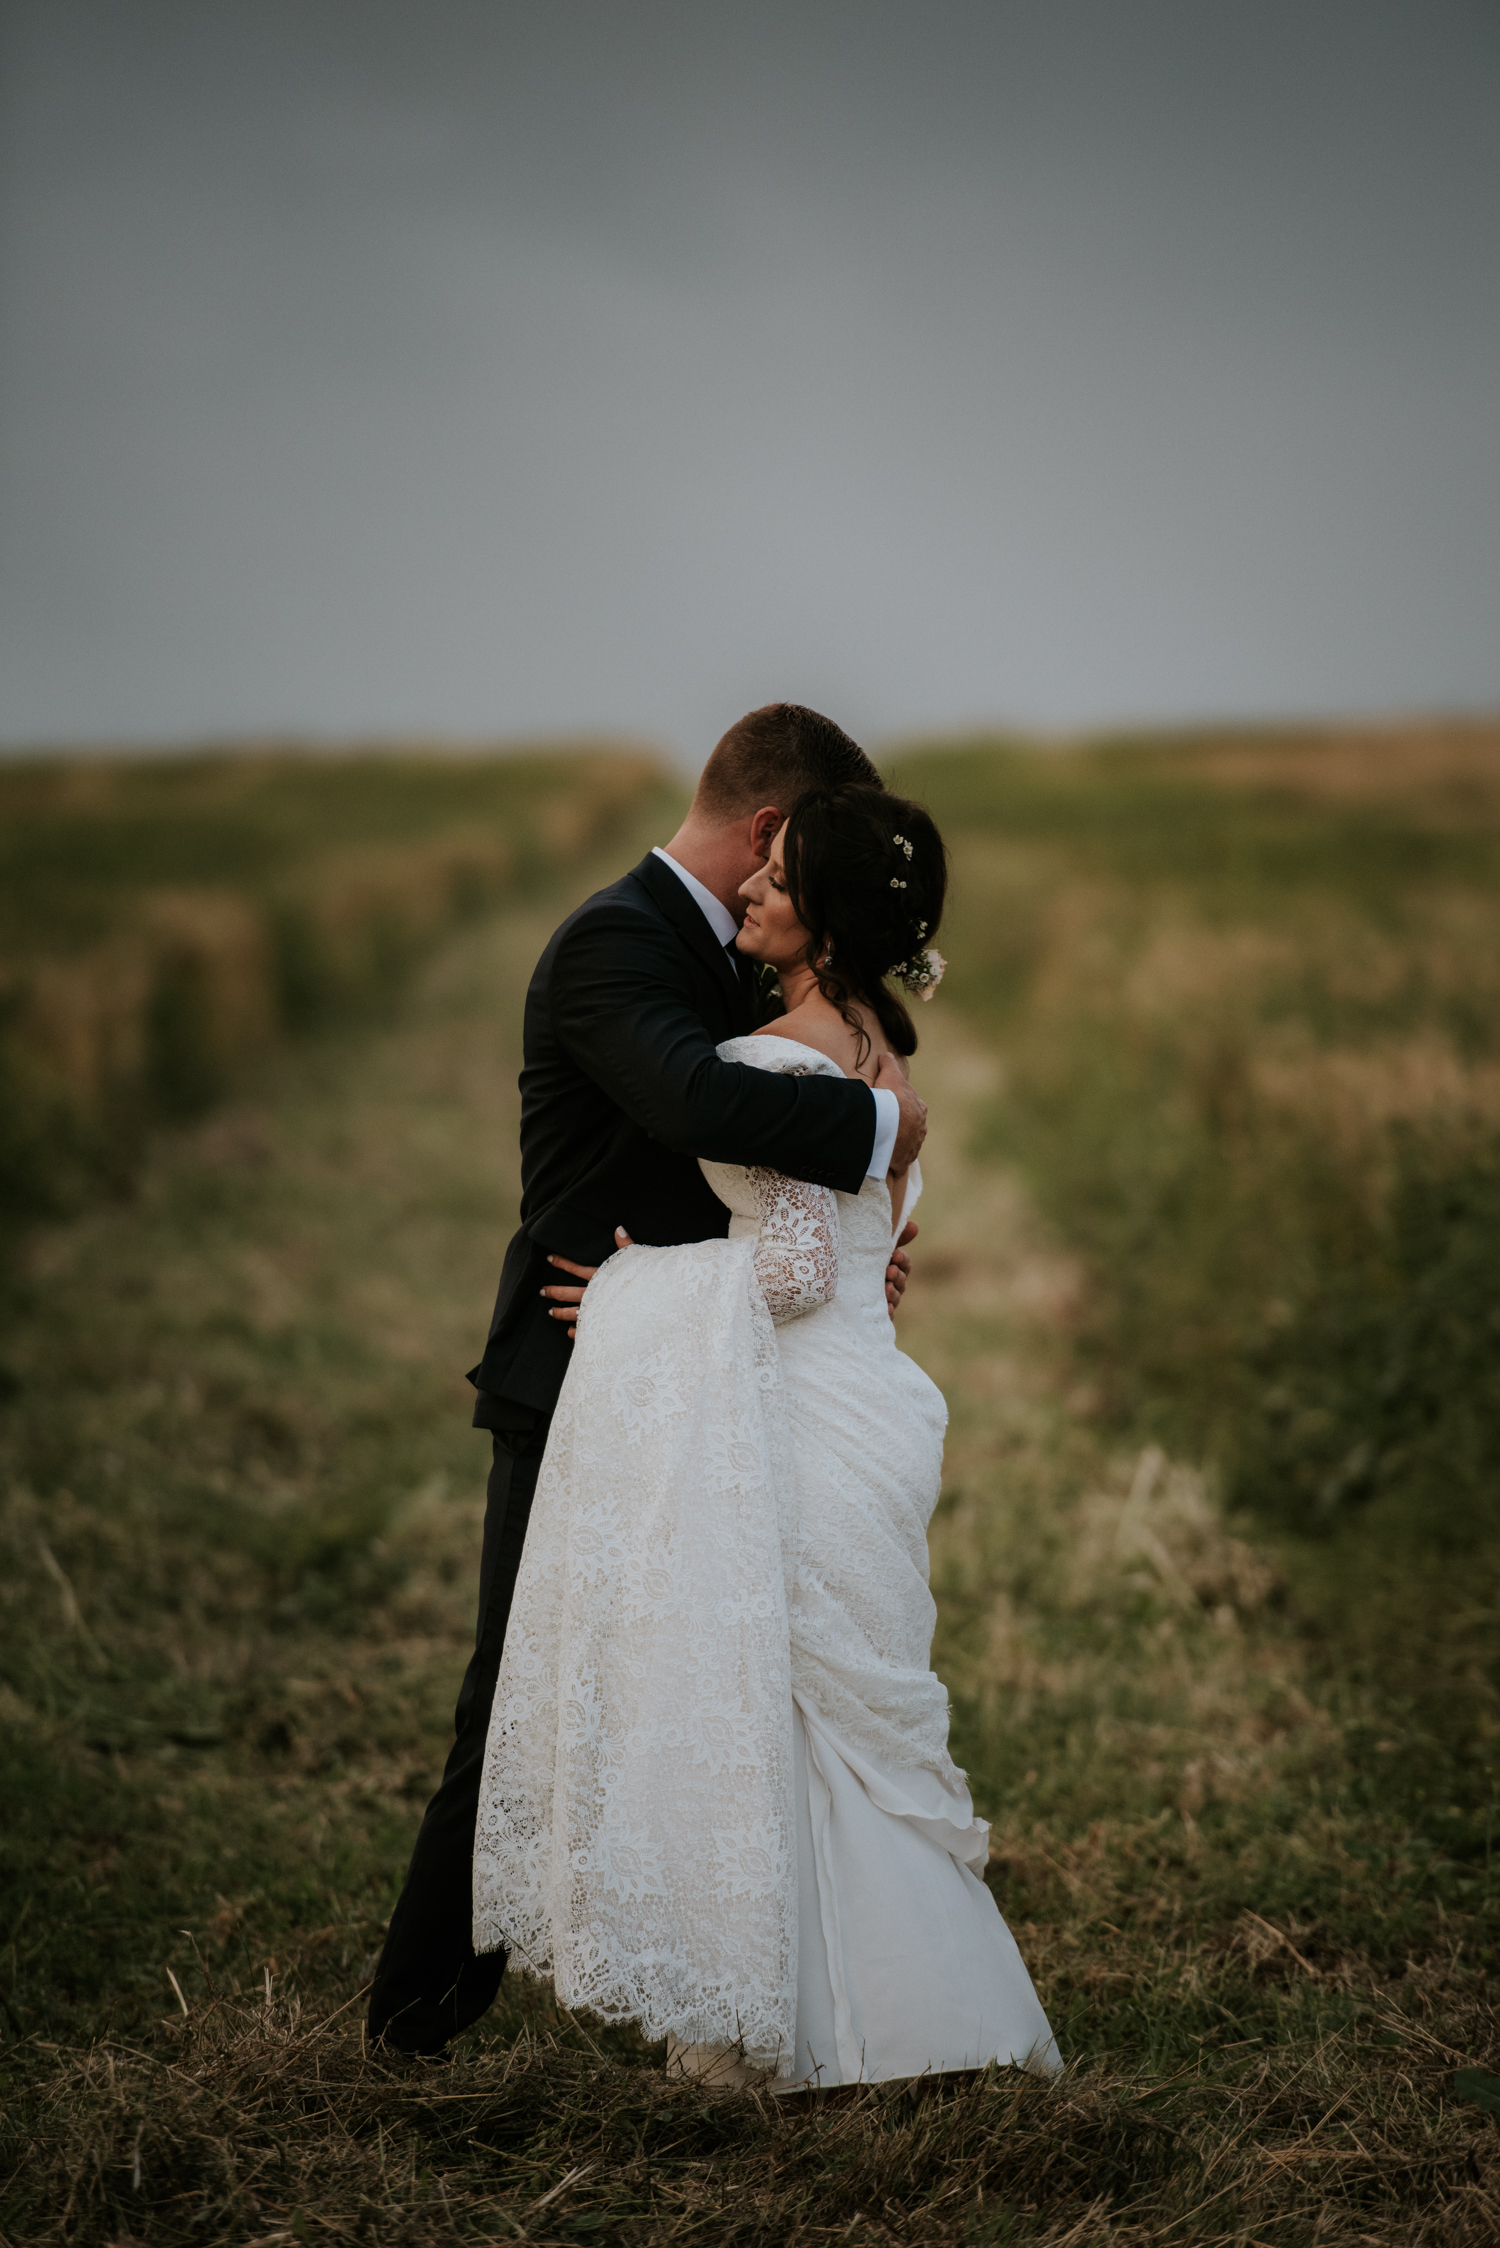 White Chapel Kalbar Wedding Photographer   Engagement-Elopement Photography-86.jpg